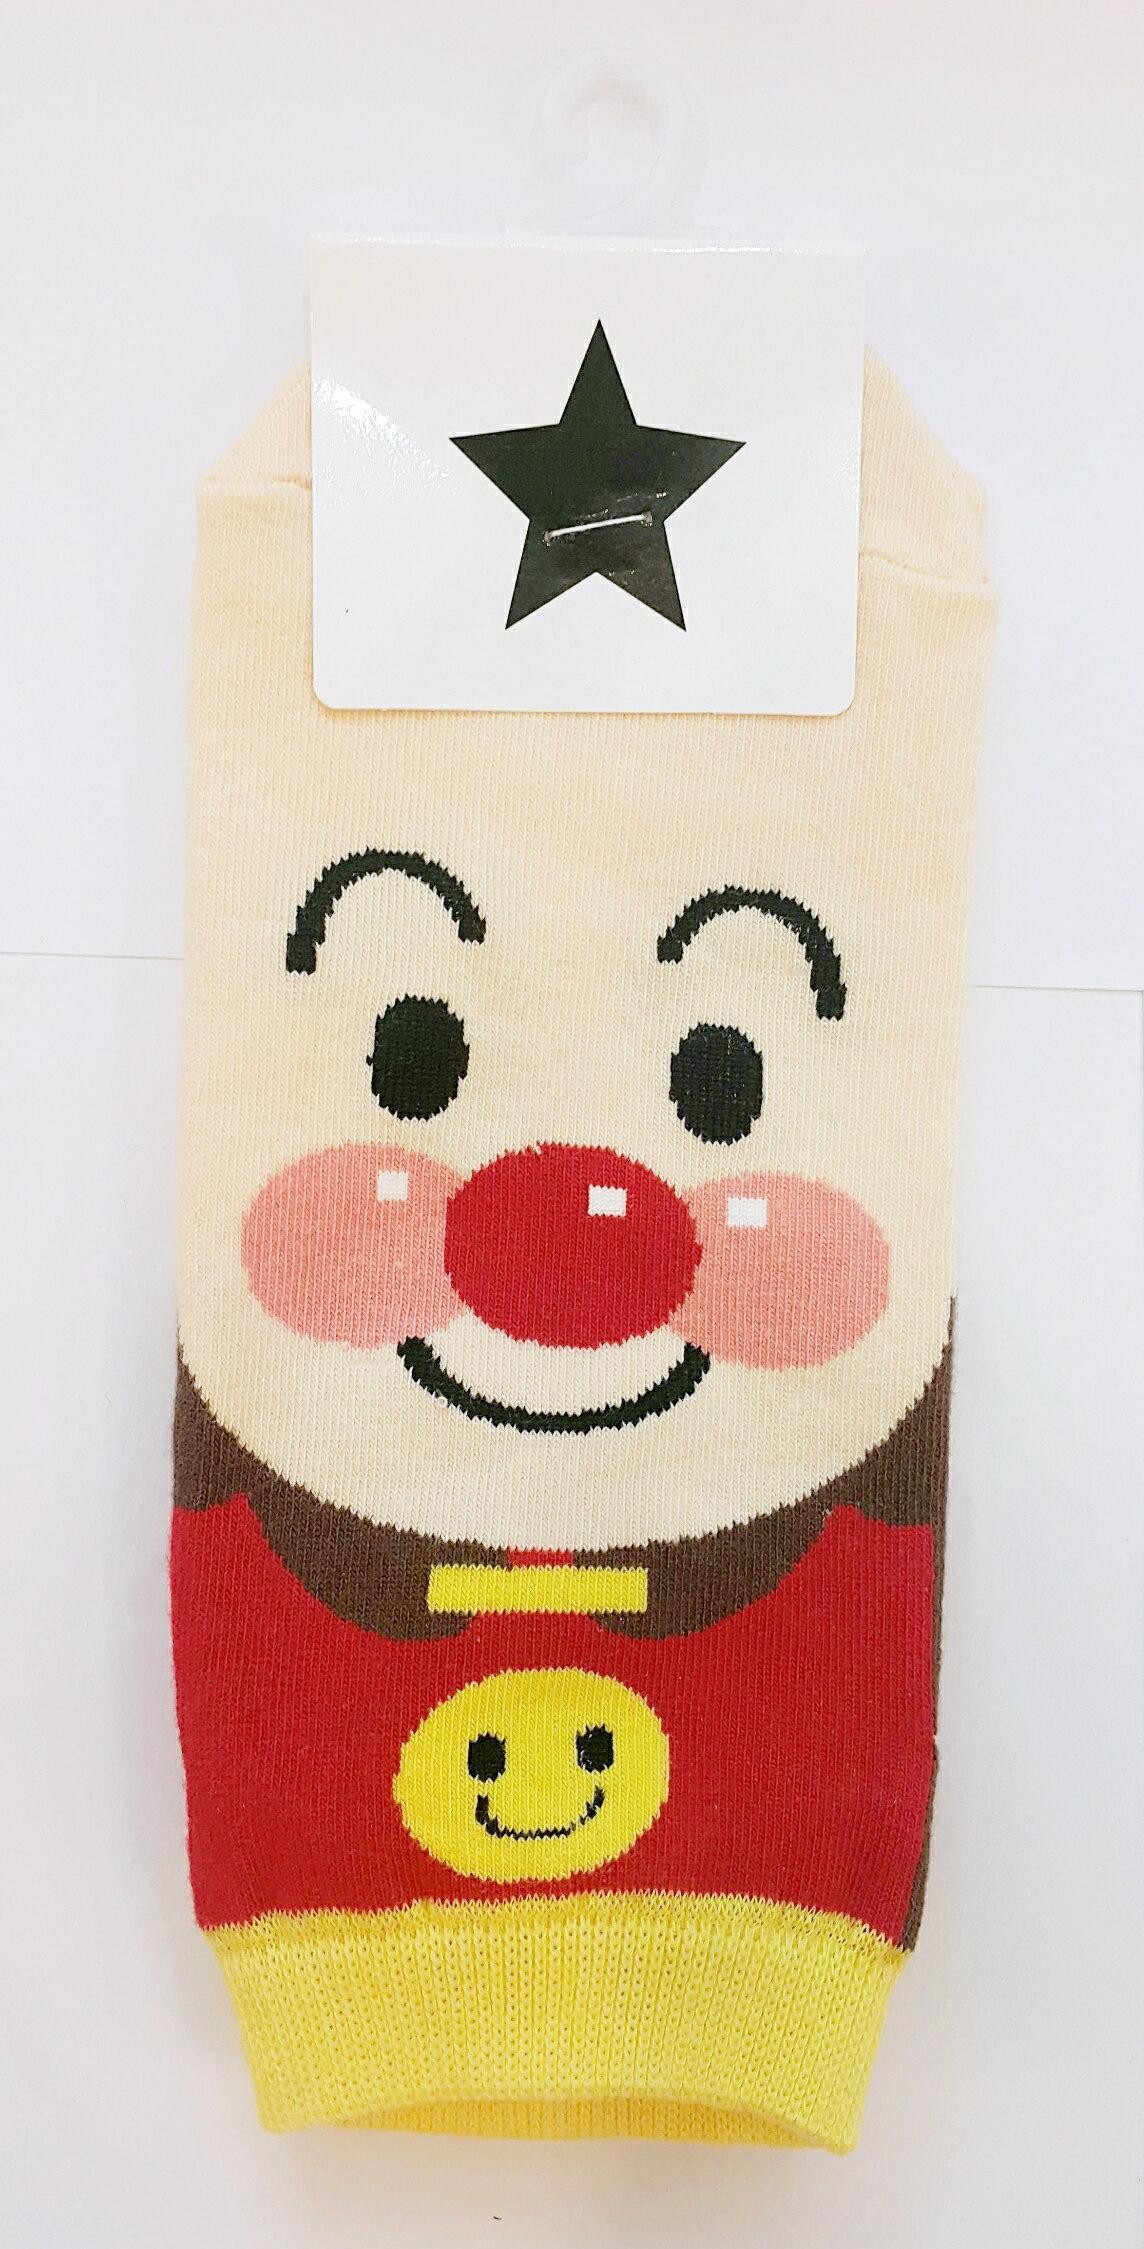 X射線【C190003】KIsssocks 麵包超人短襪(22-26cm),大人/小孩短襪/船型襪/sanrio卡通/襪子